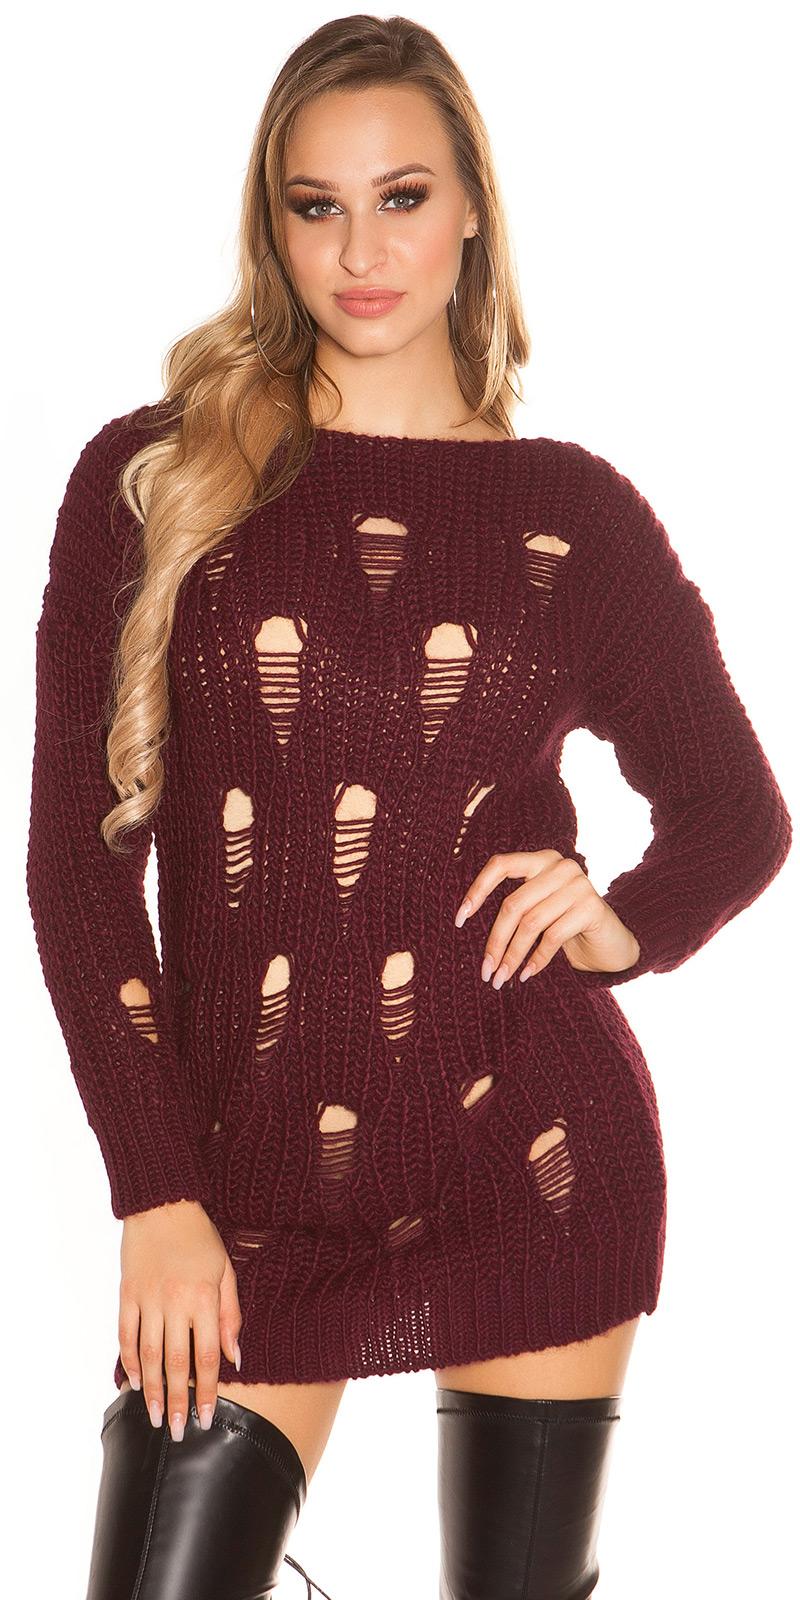 Pulovere la moda model gros tricot long aspect uzat